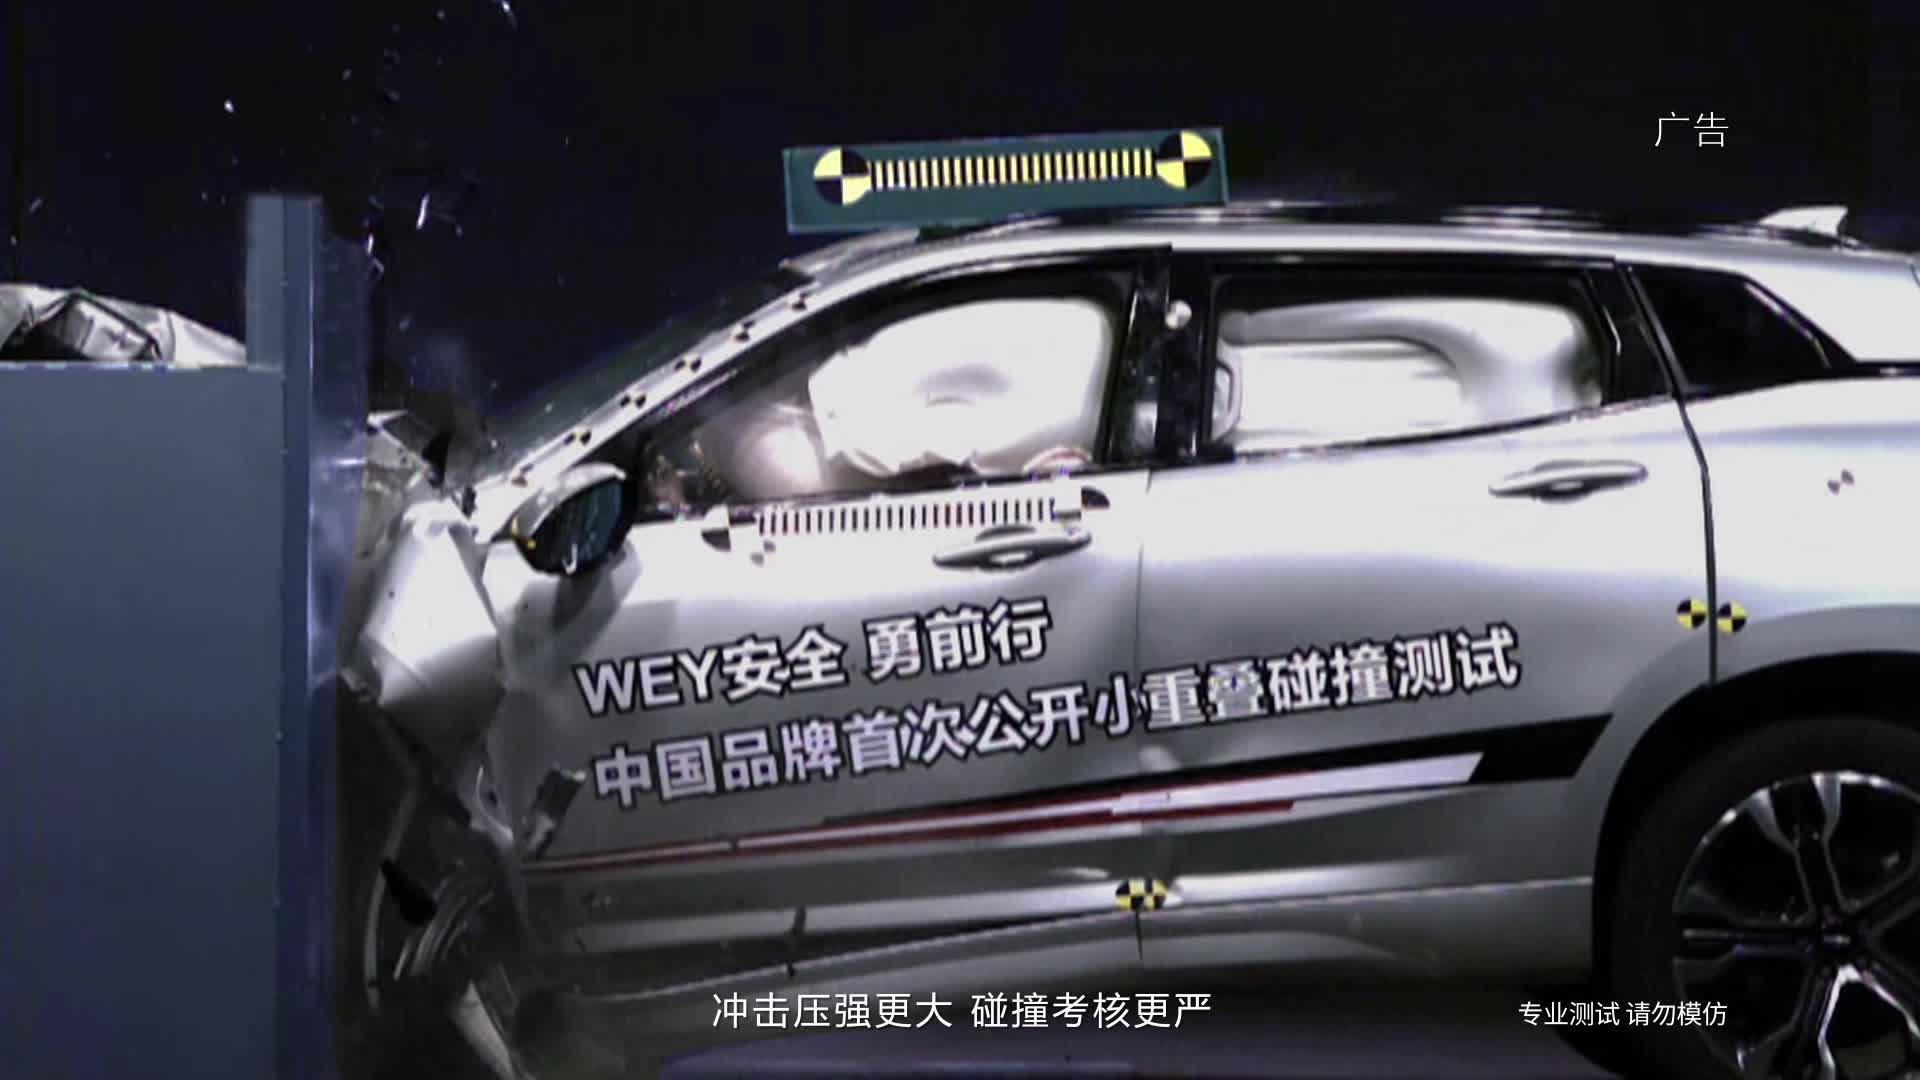 WEY VV7碰撞测试 国产安全豪华SUV